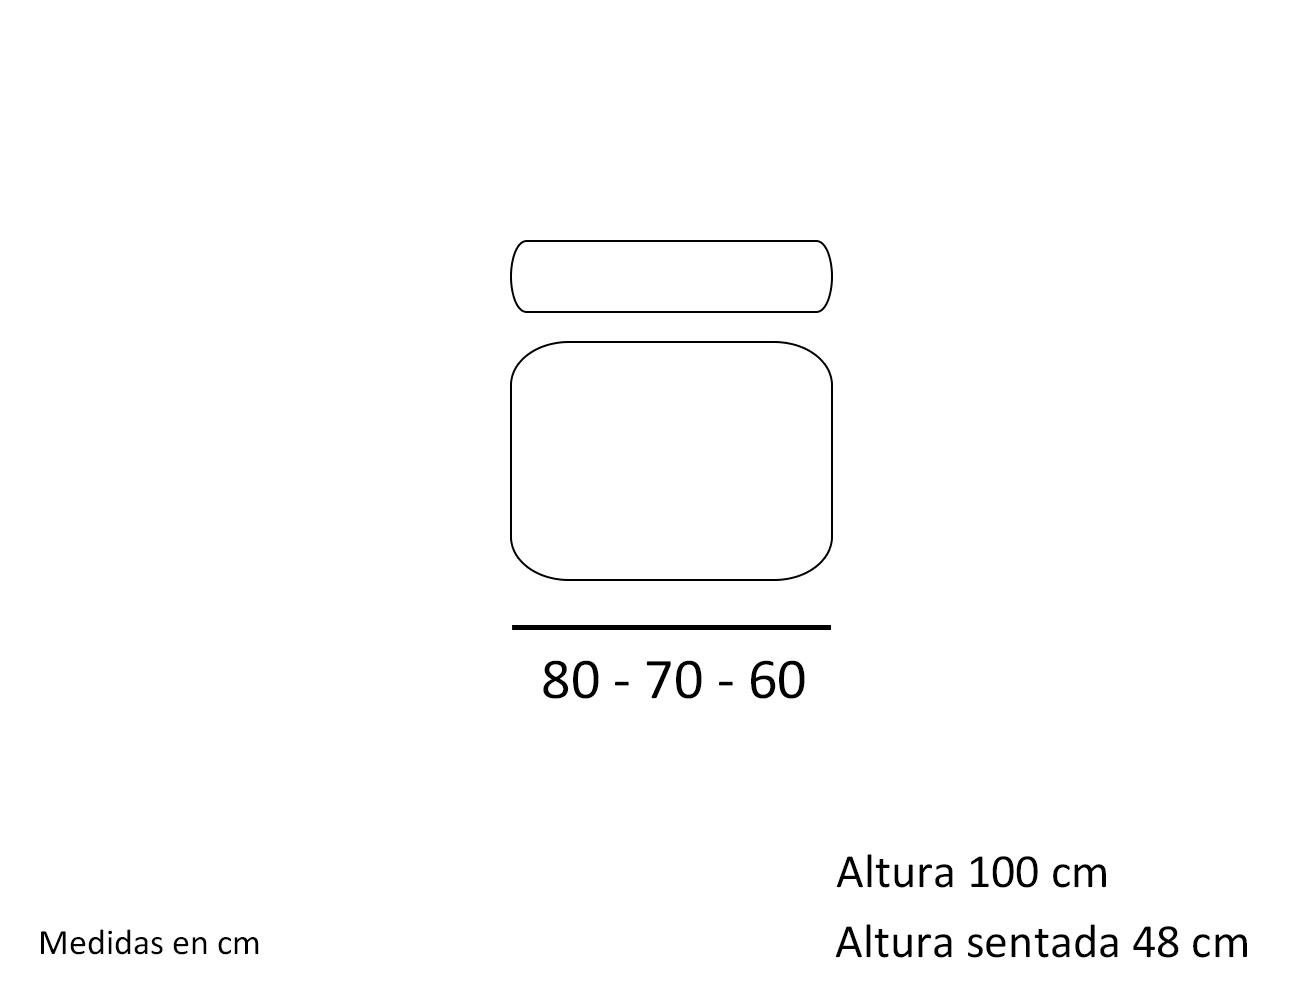 Croquis modulo 1 plaza sin brazo 60 70 801